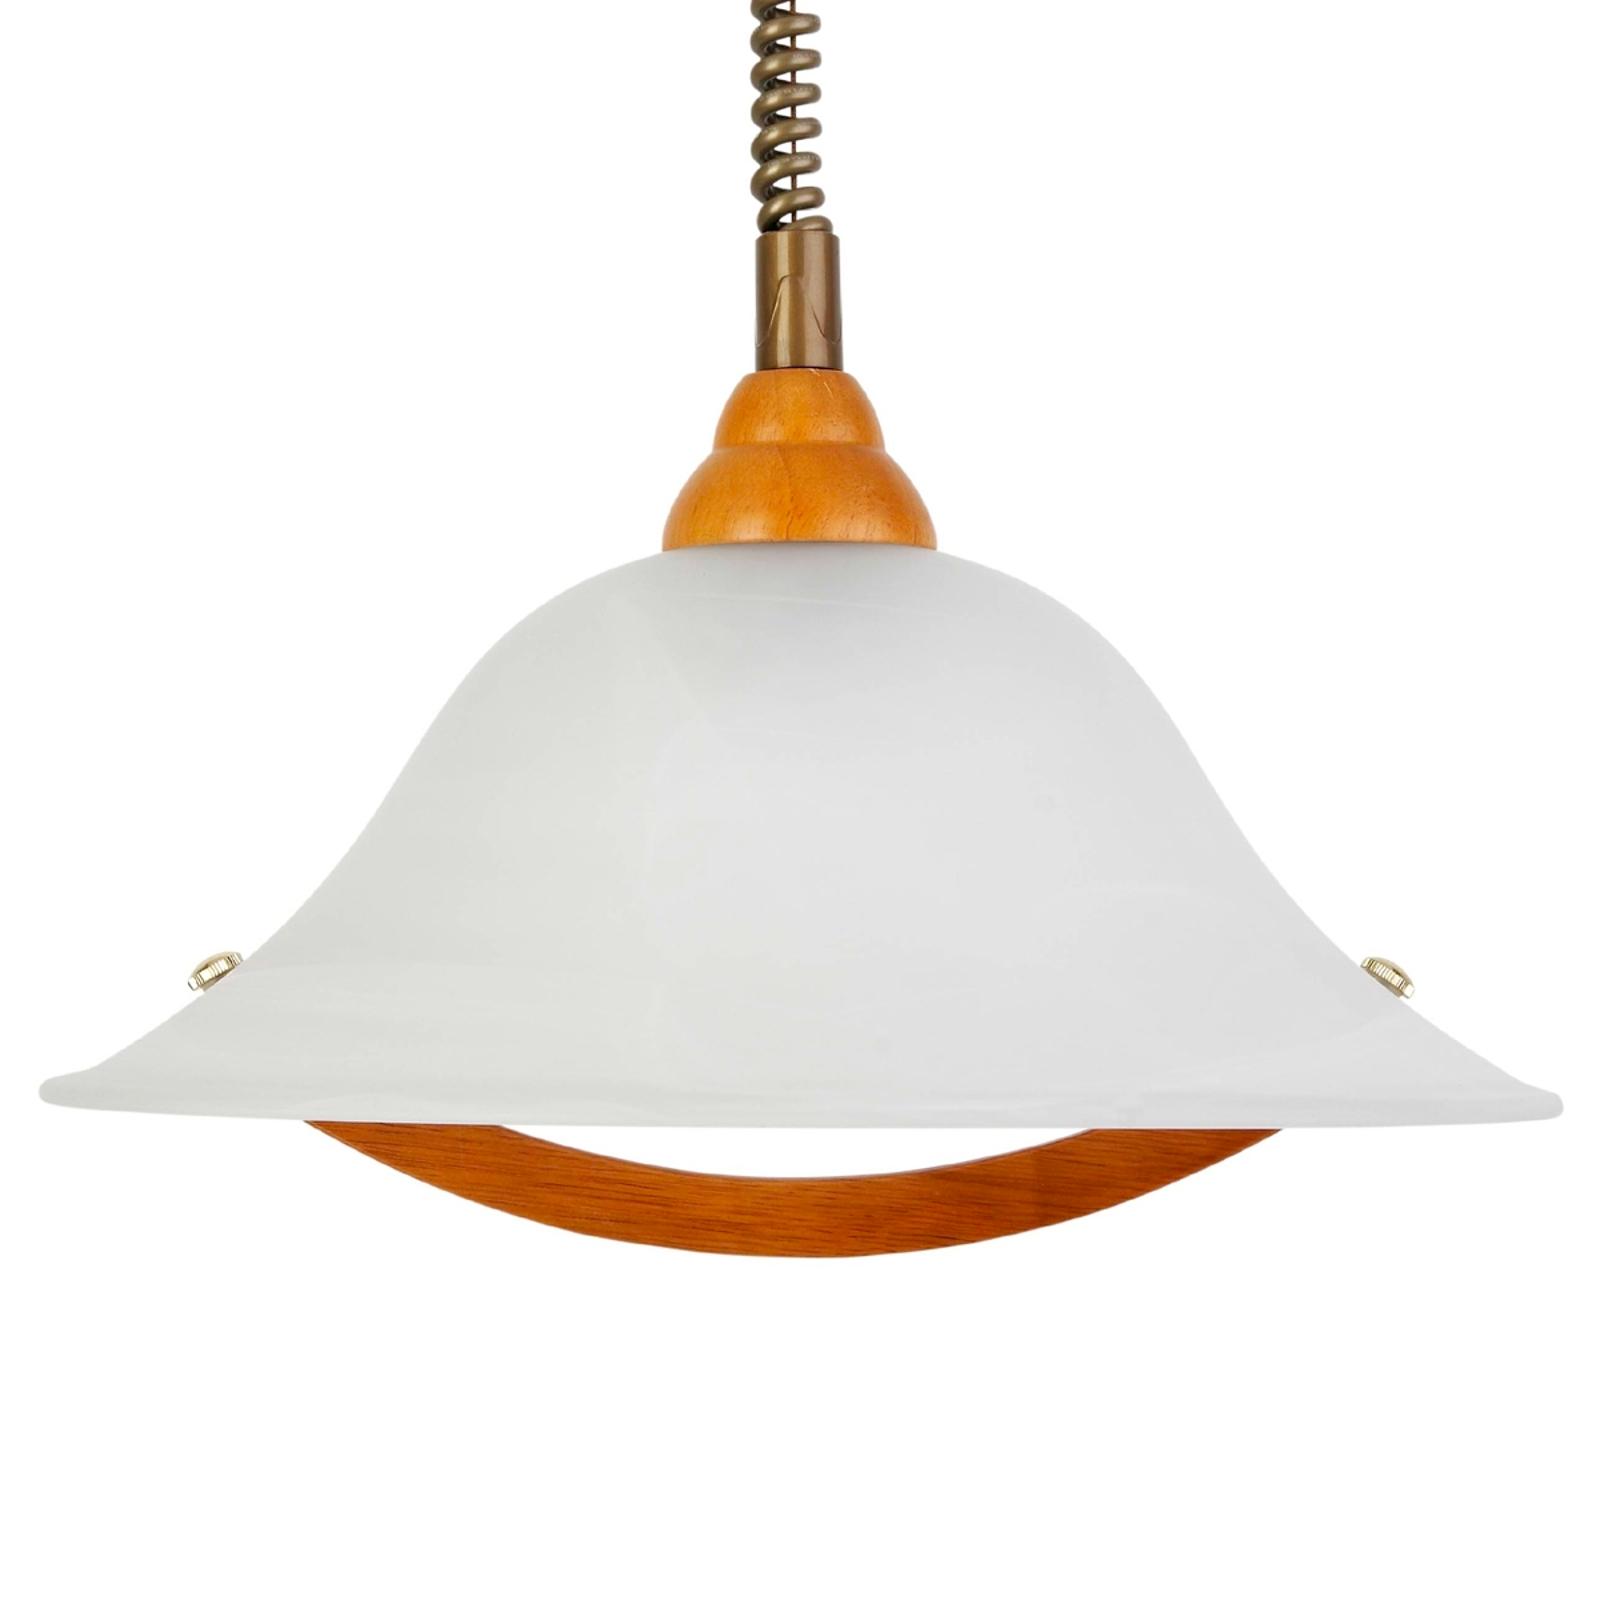 Stylish hanging light Torbole_1508231_1